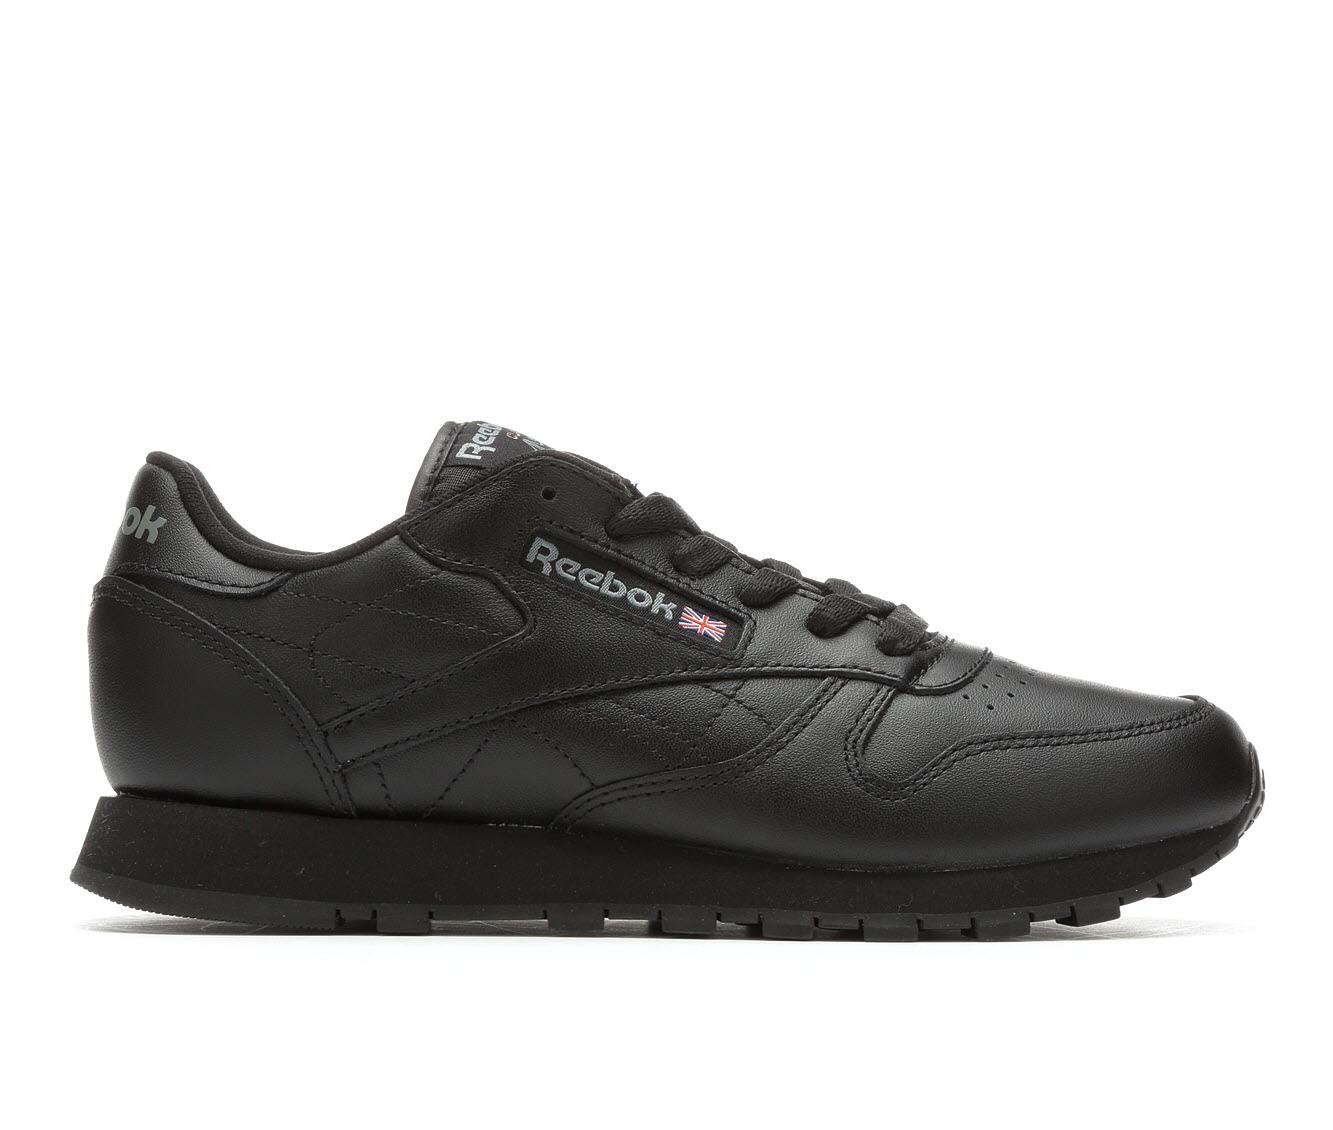 Women's Reebok Classic Leather Jog Sneakers (Black - Size 11) 354214